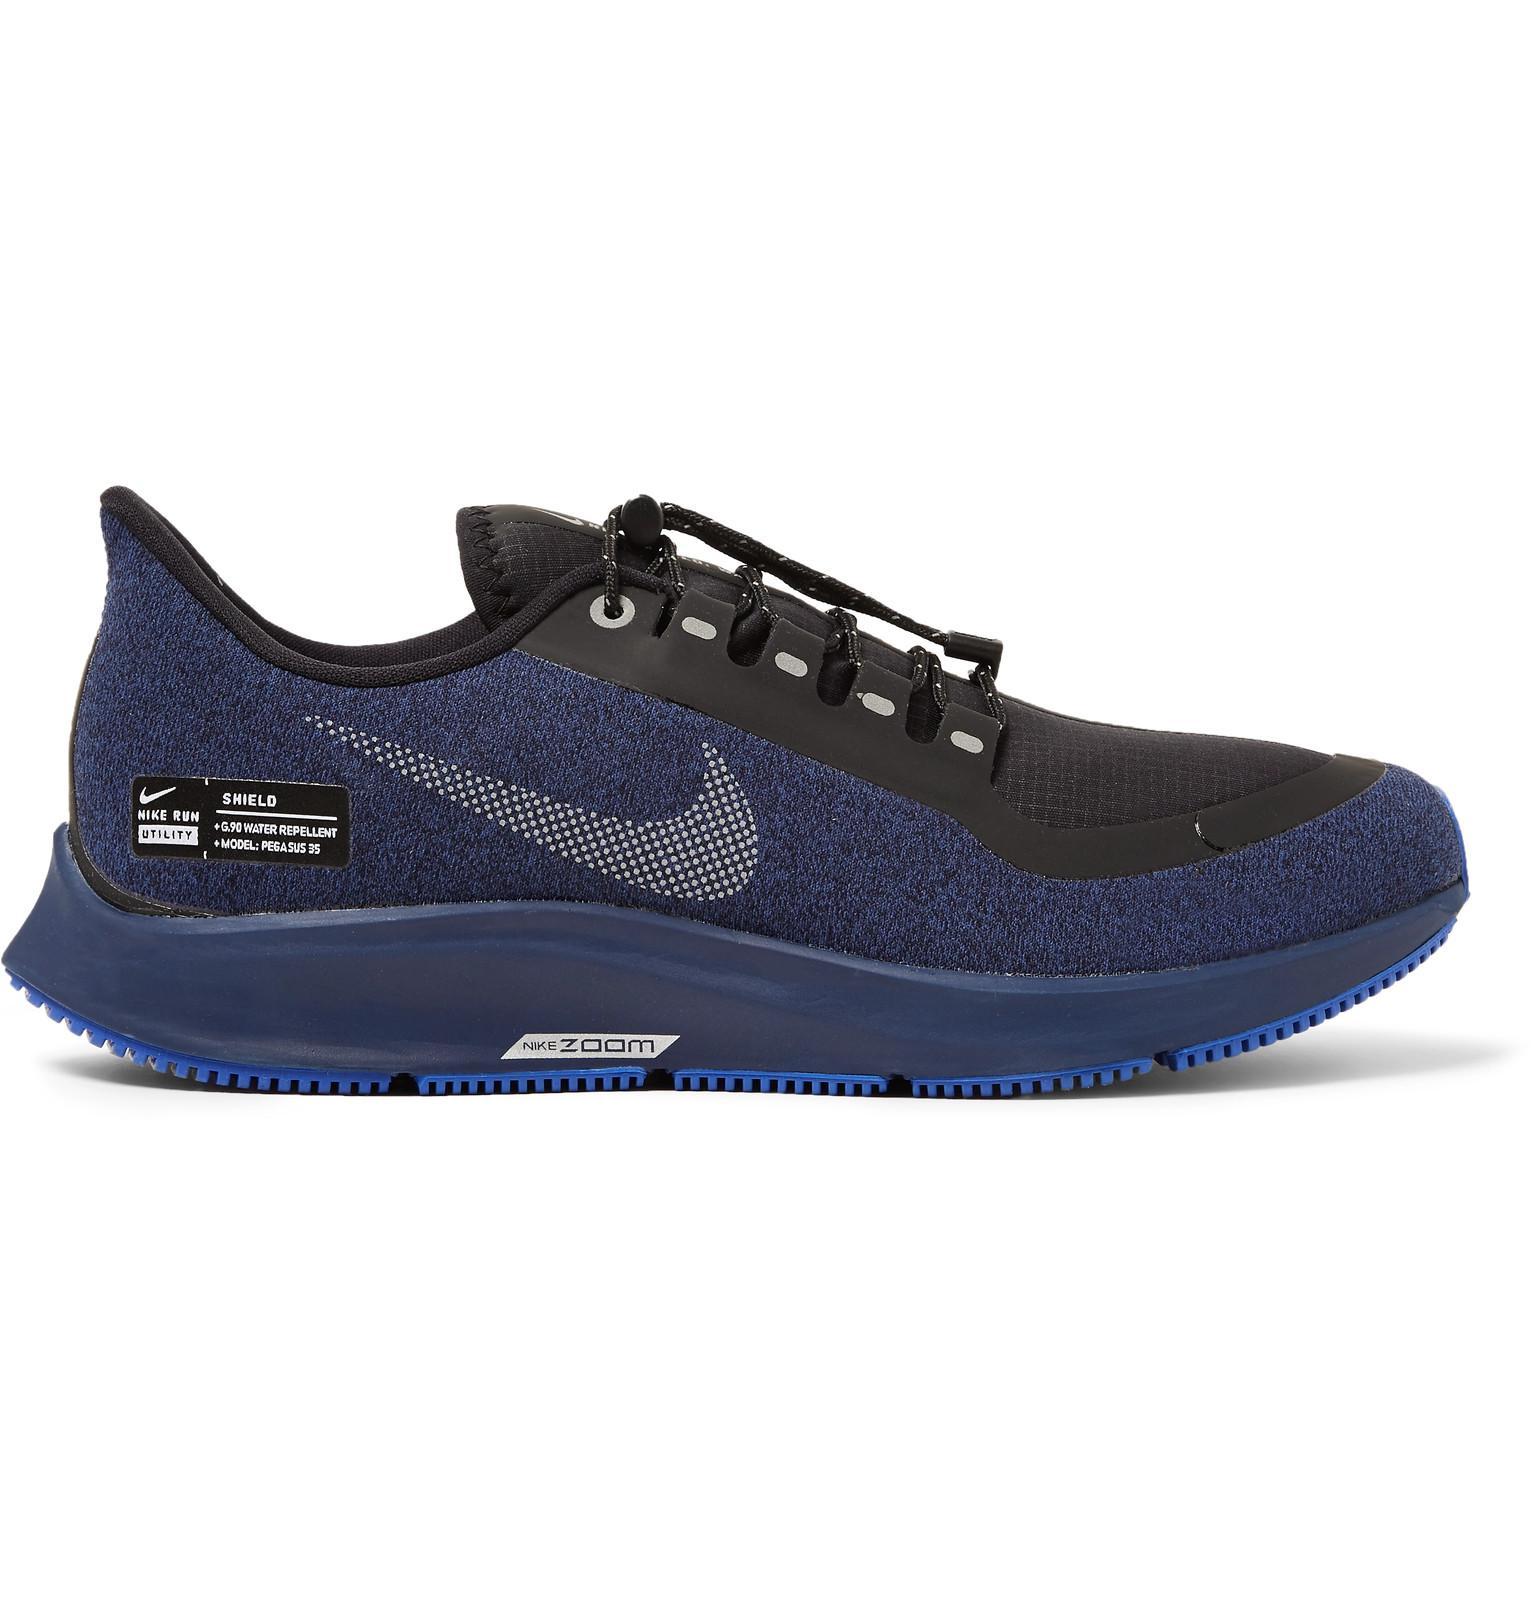 e512332e8779c6 Lyst - Nike Air Zoom Pegasus 35 Shield Water-repellent Sneakers in ...